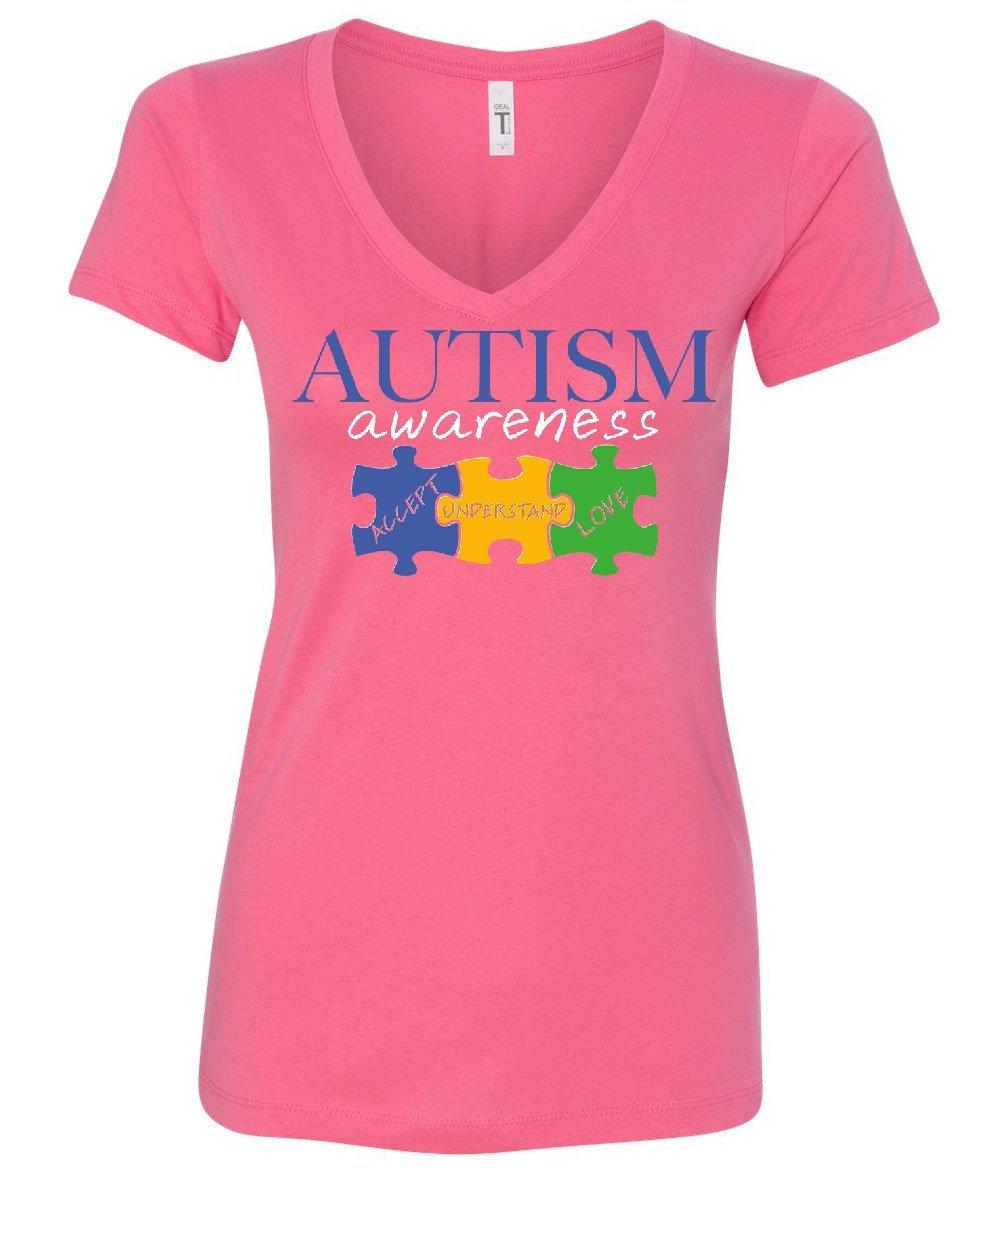 Tee Hunt Autism Awareness T Shirt Accept Understand Love Inspire Support 5627